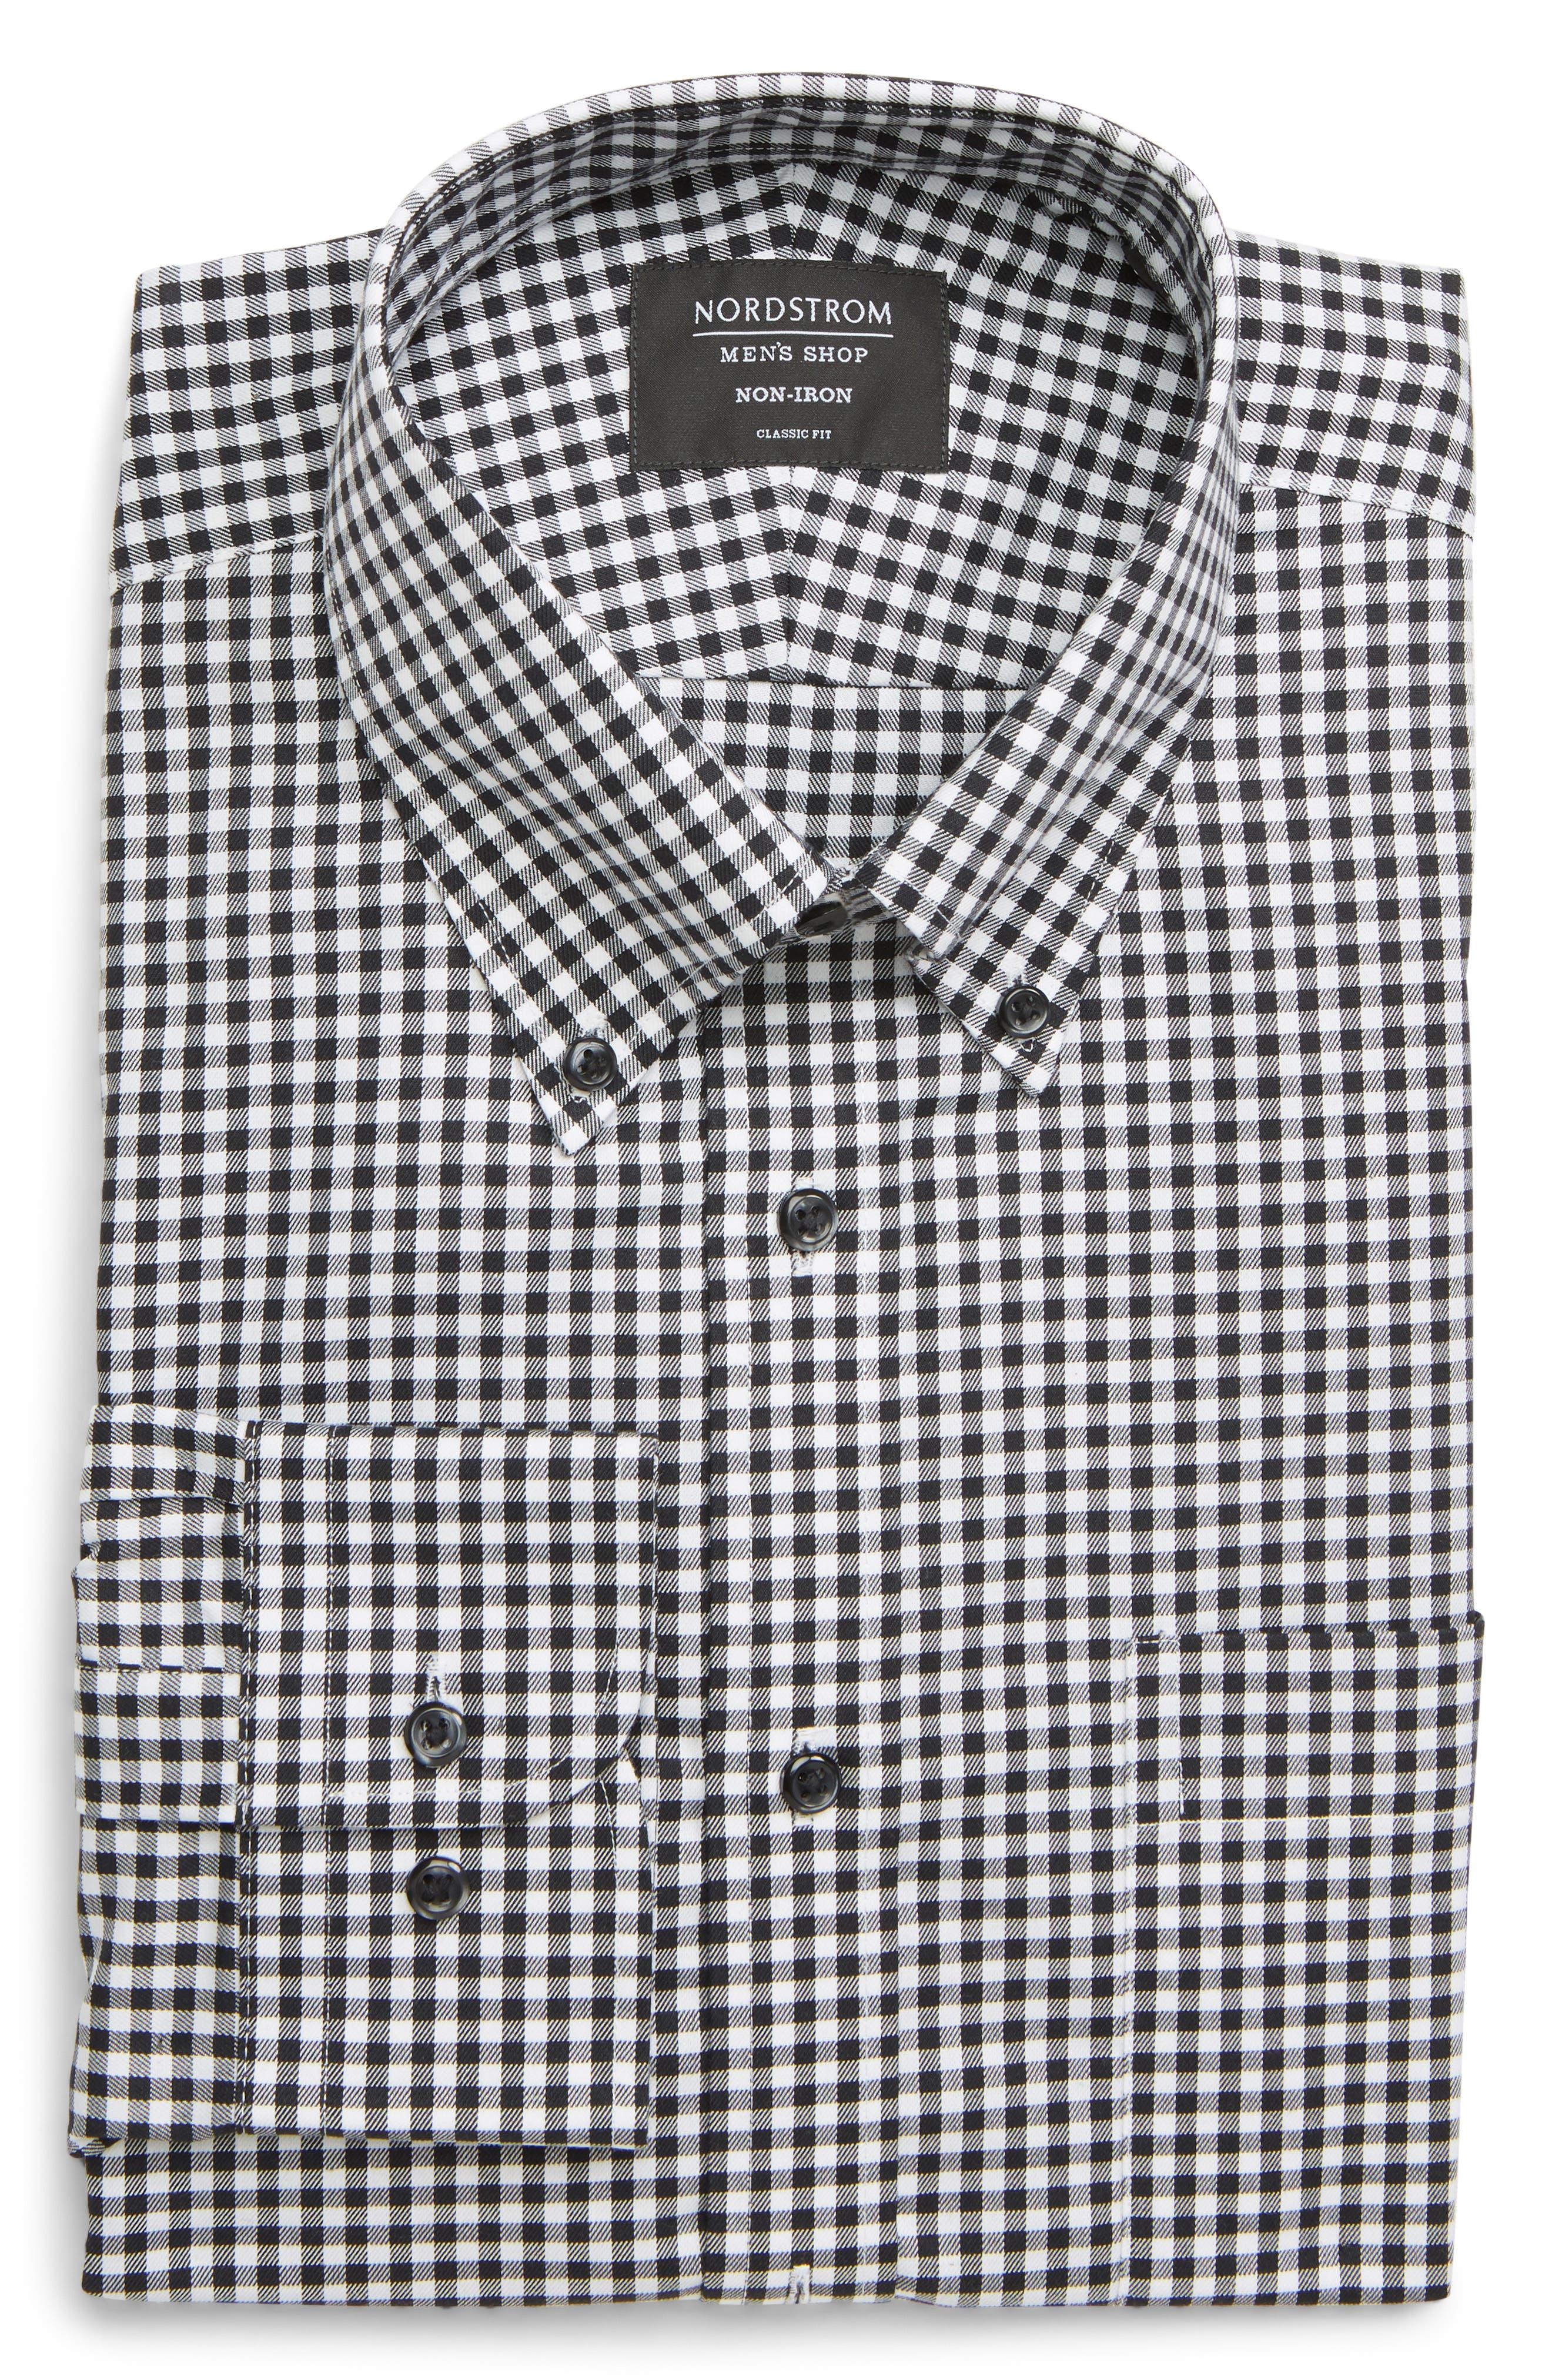 Men's Big & Tall Nordstrom Classic Fit Non-Iron Gingham Dress Shirt